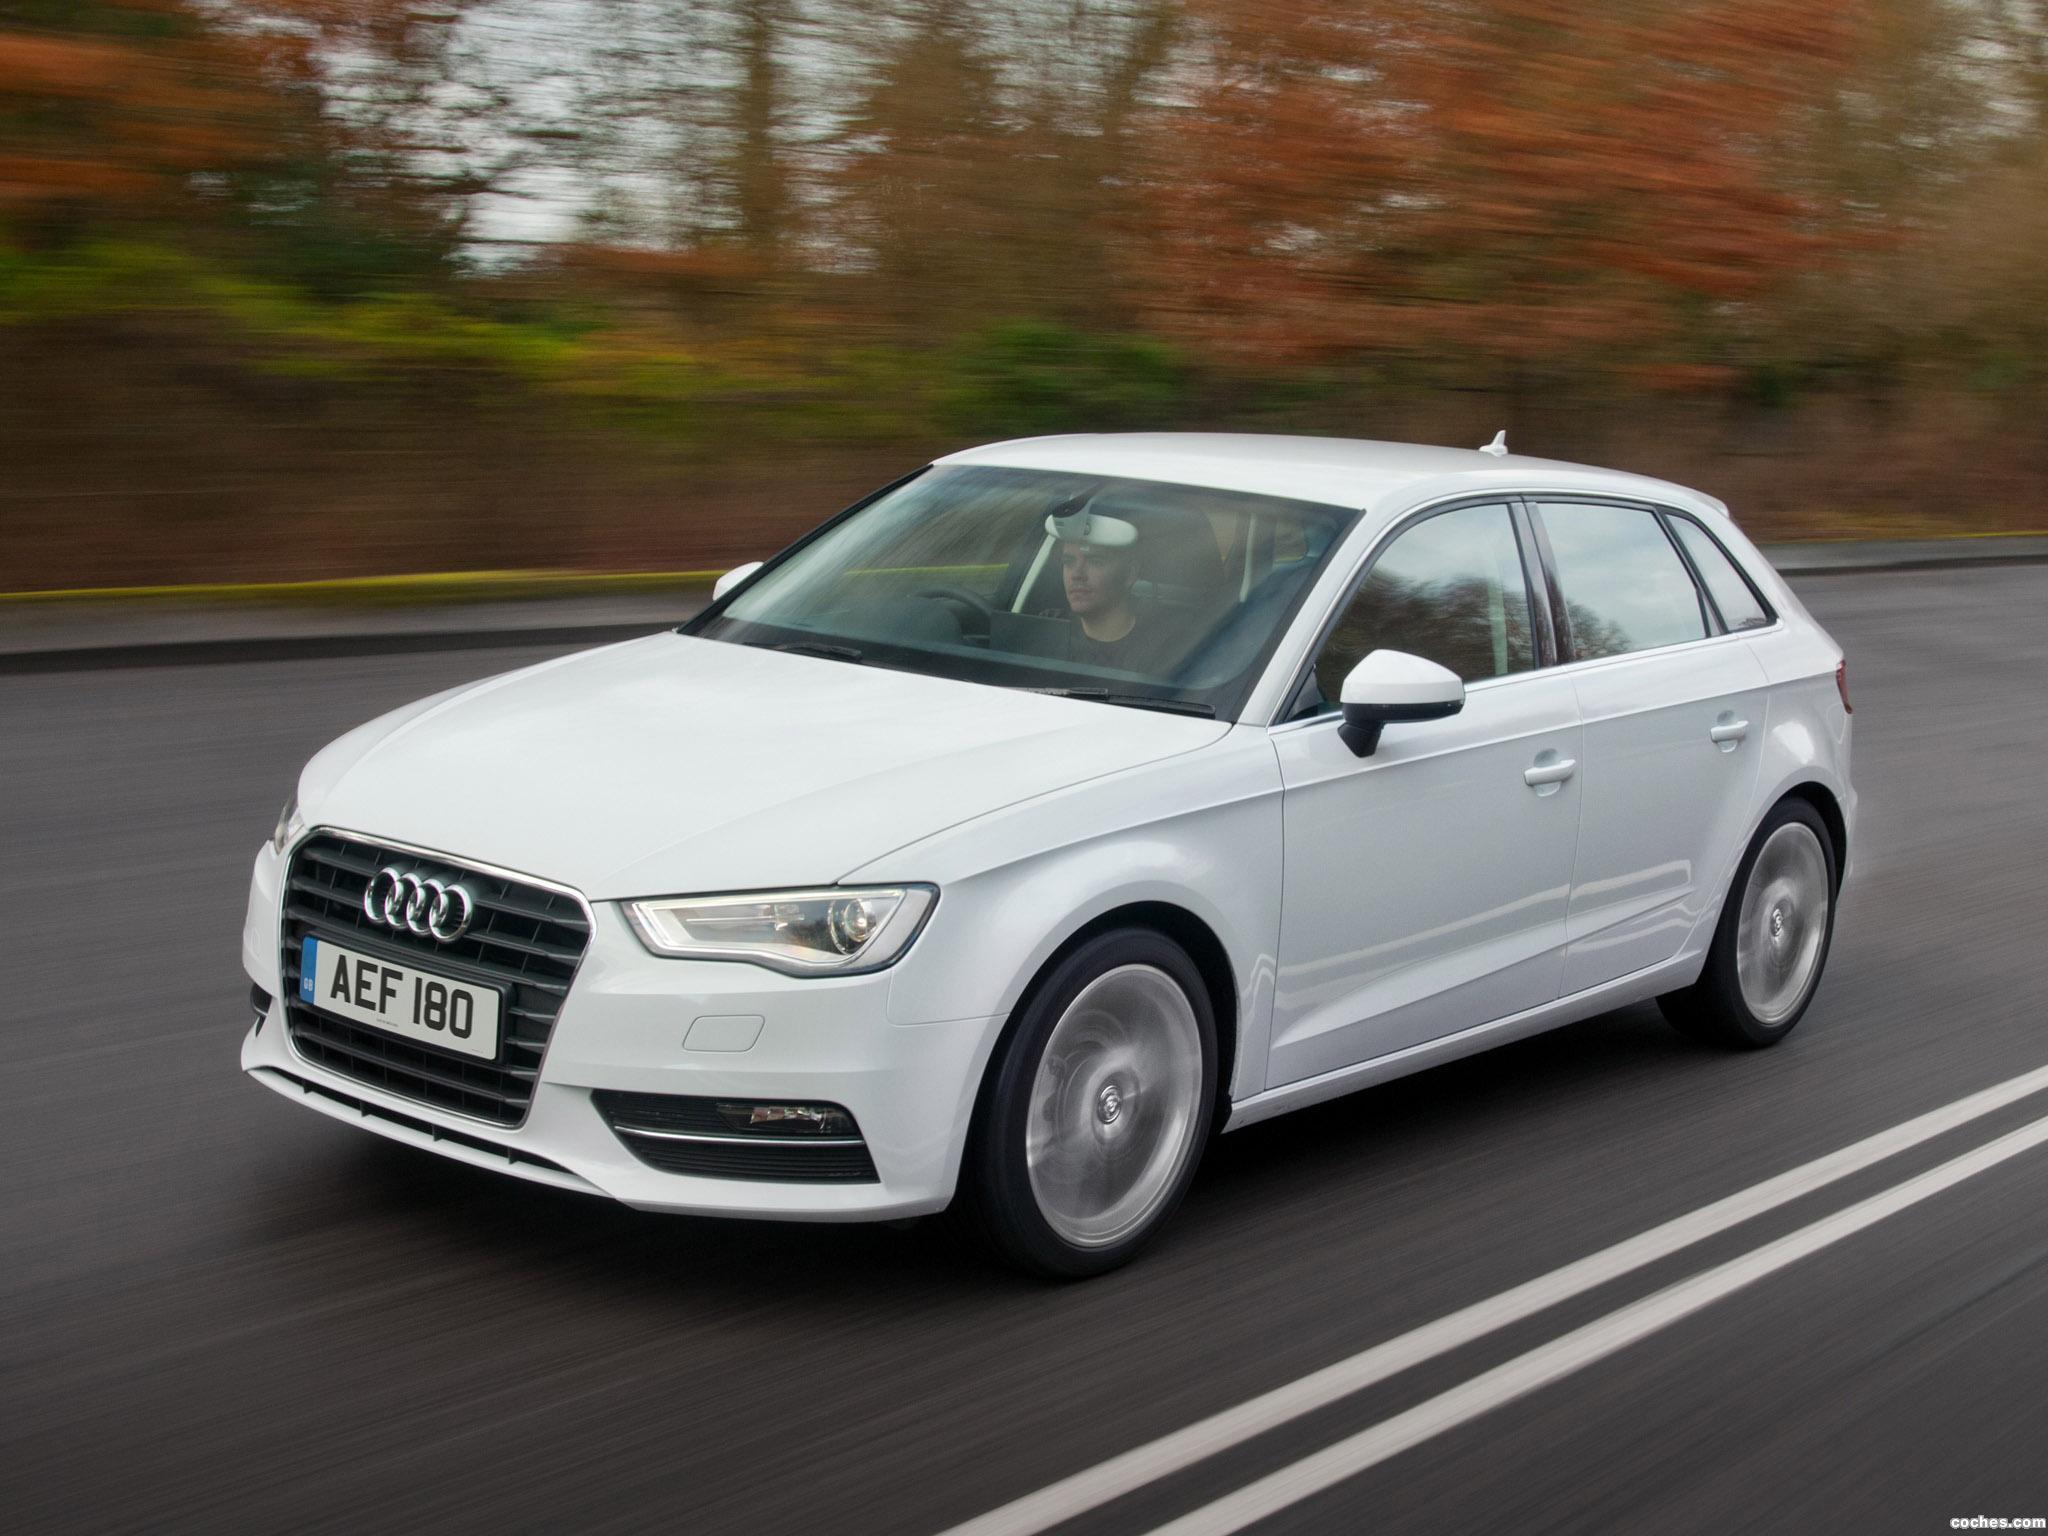 Foto 0 de Audi A3 Sportback 1.8T UK 2013